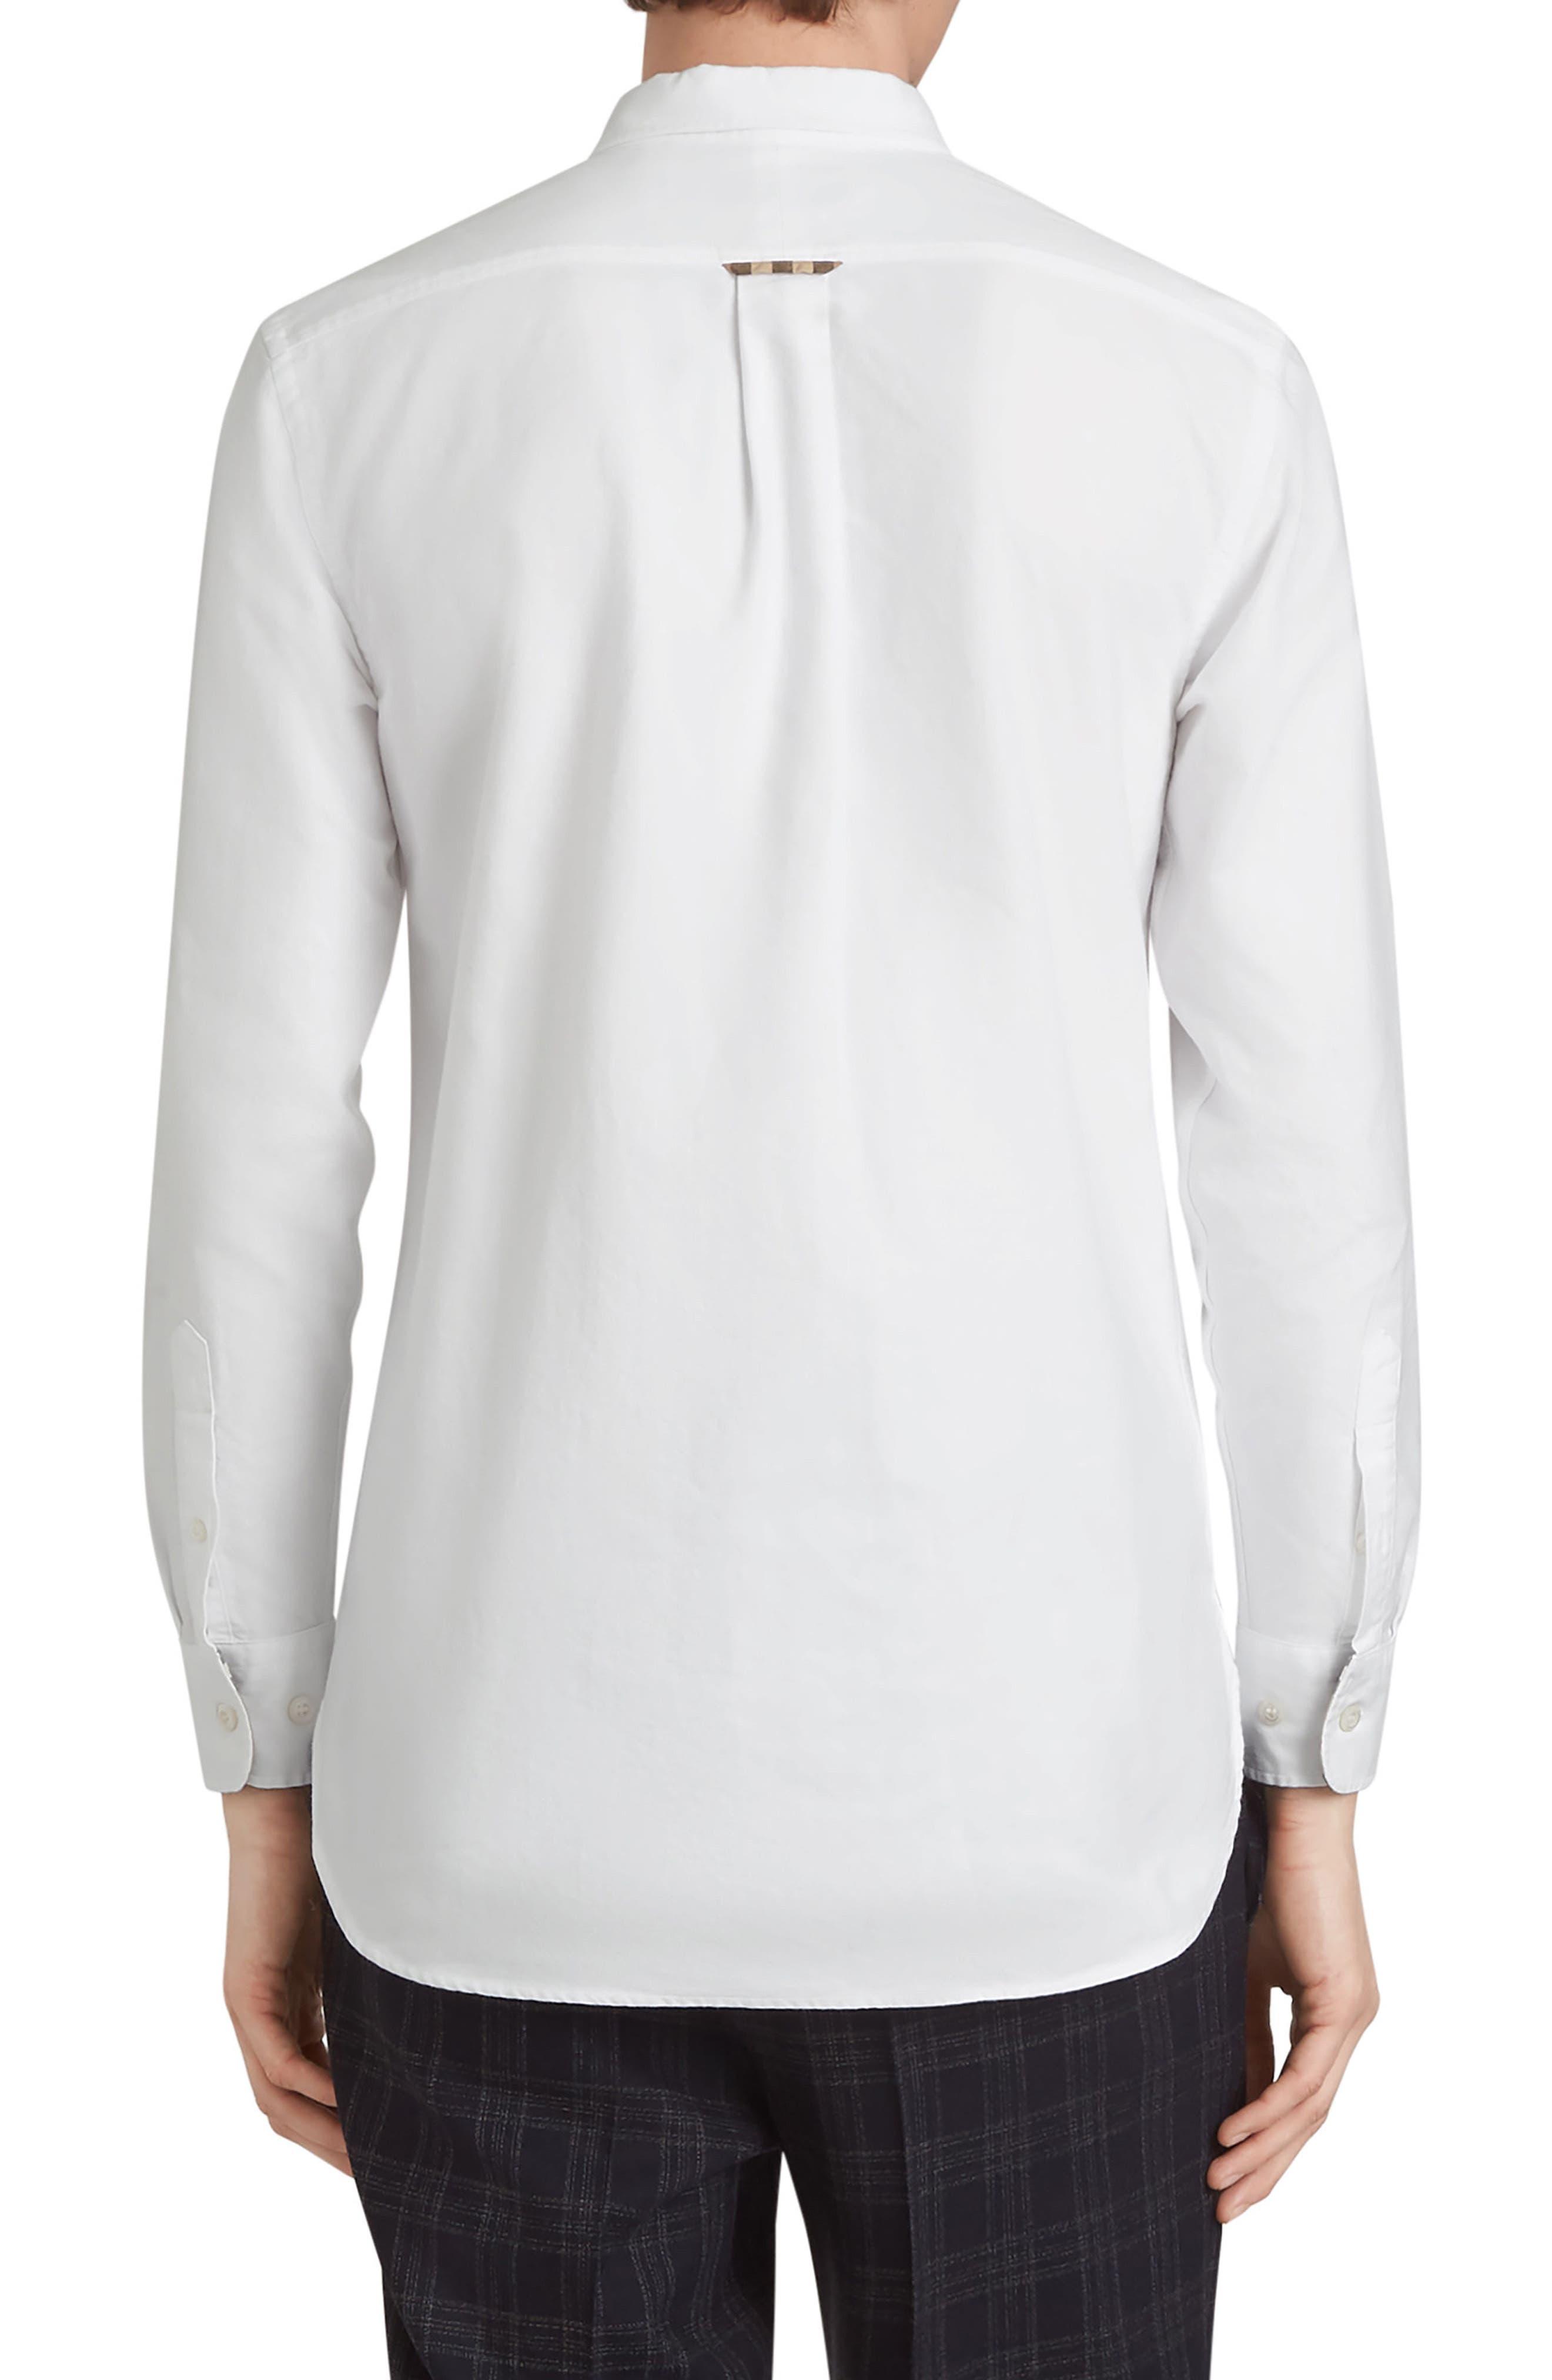 BURBERRY,                             Harry Check Trim Sport Shirt,                             Alternate thumbnail 3, color,                             WHITE